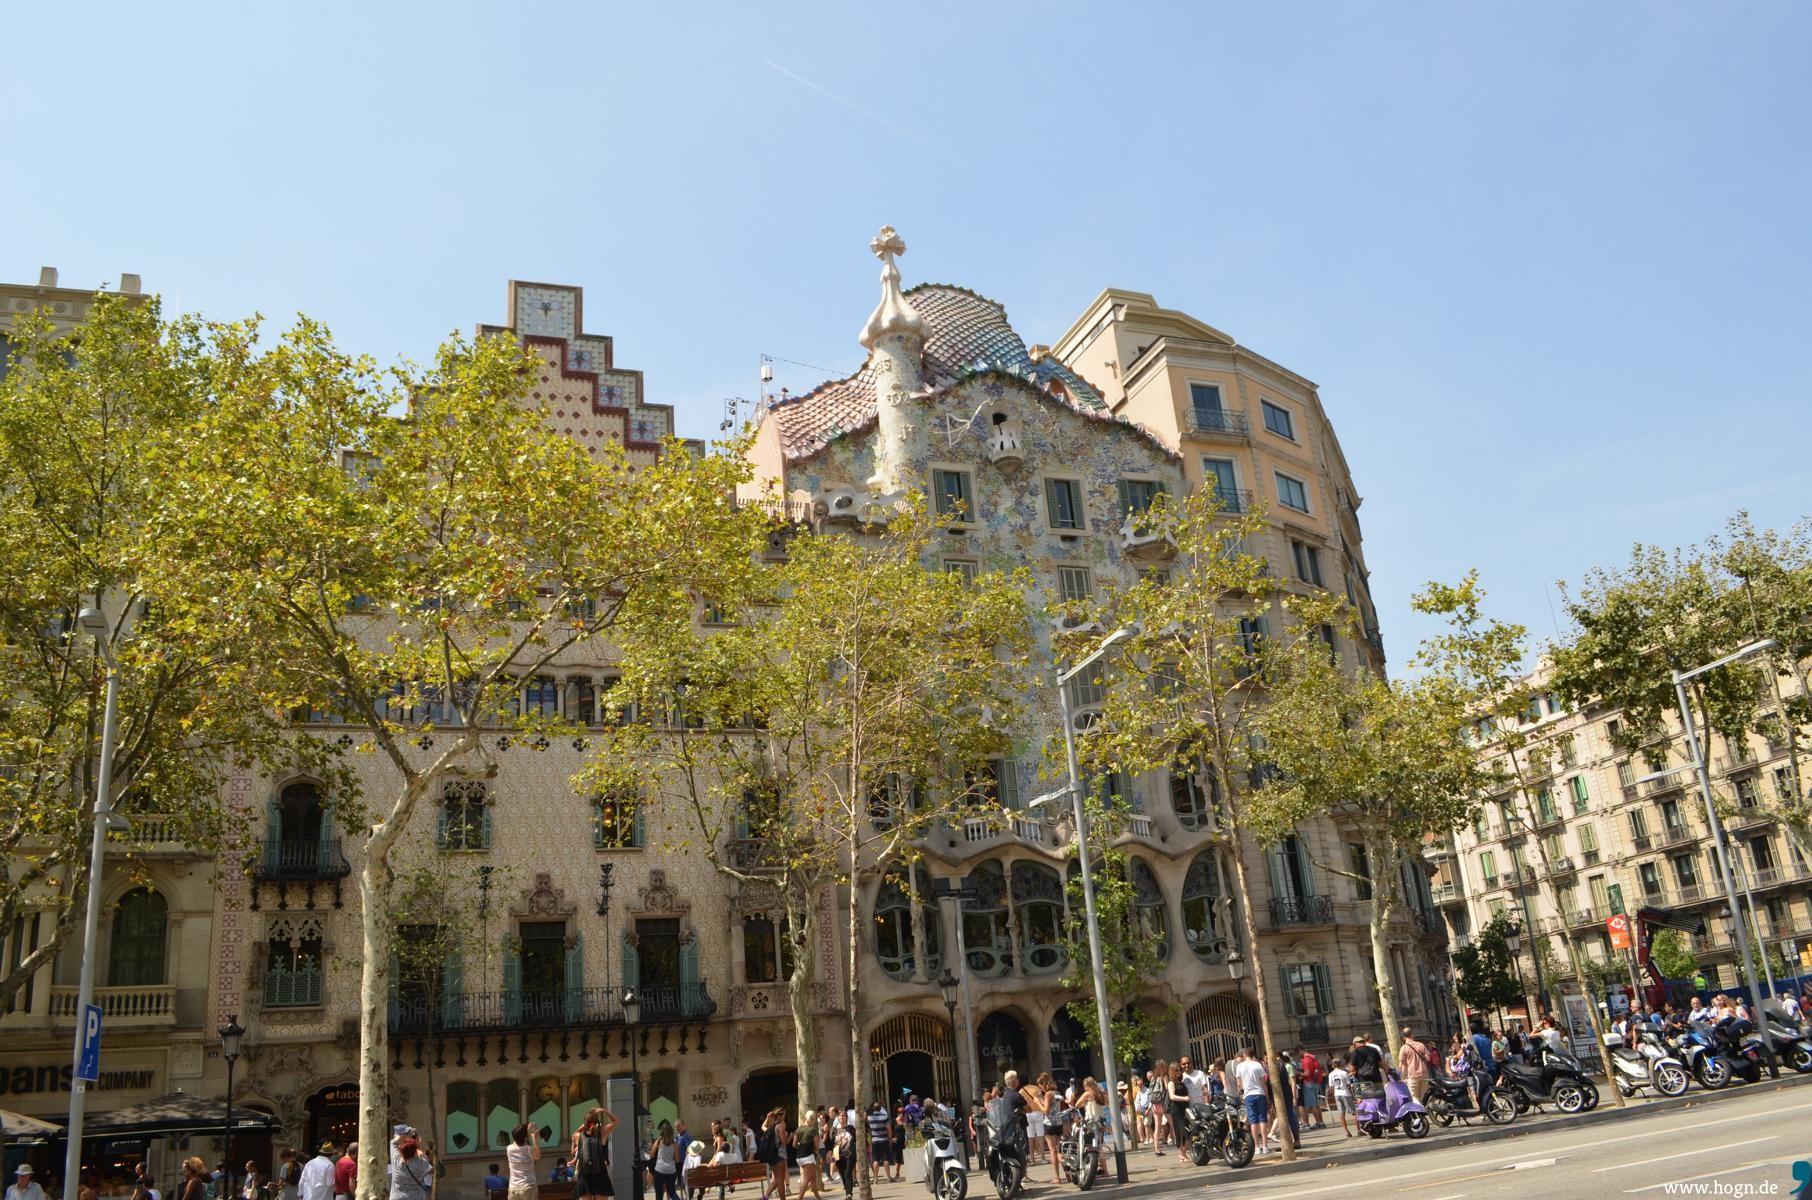 kuenstler gaudi haus in barcelona